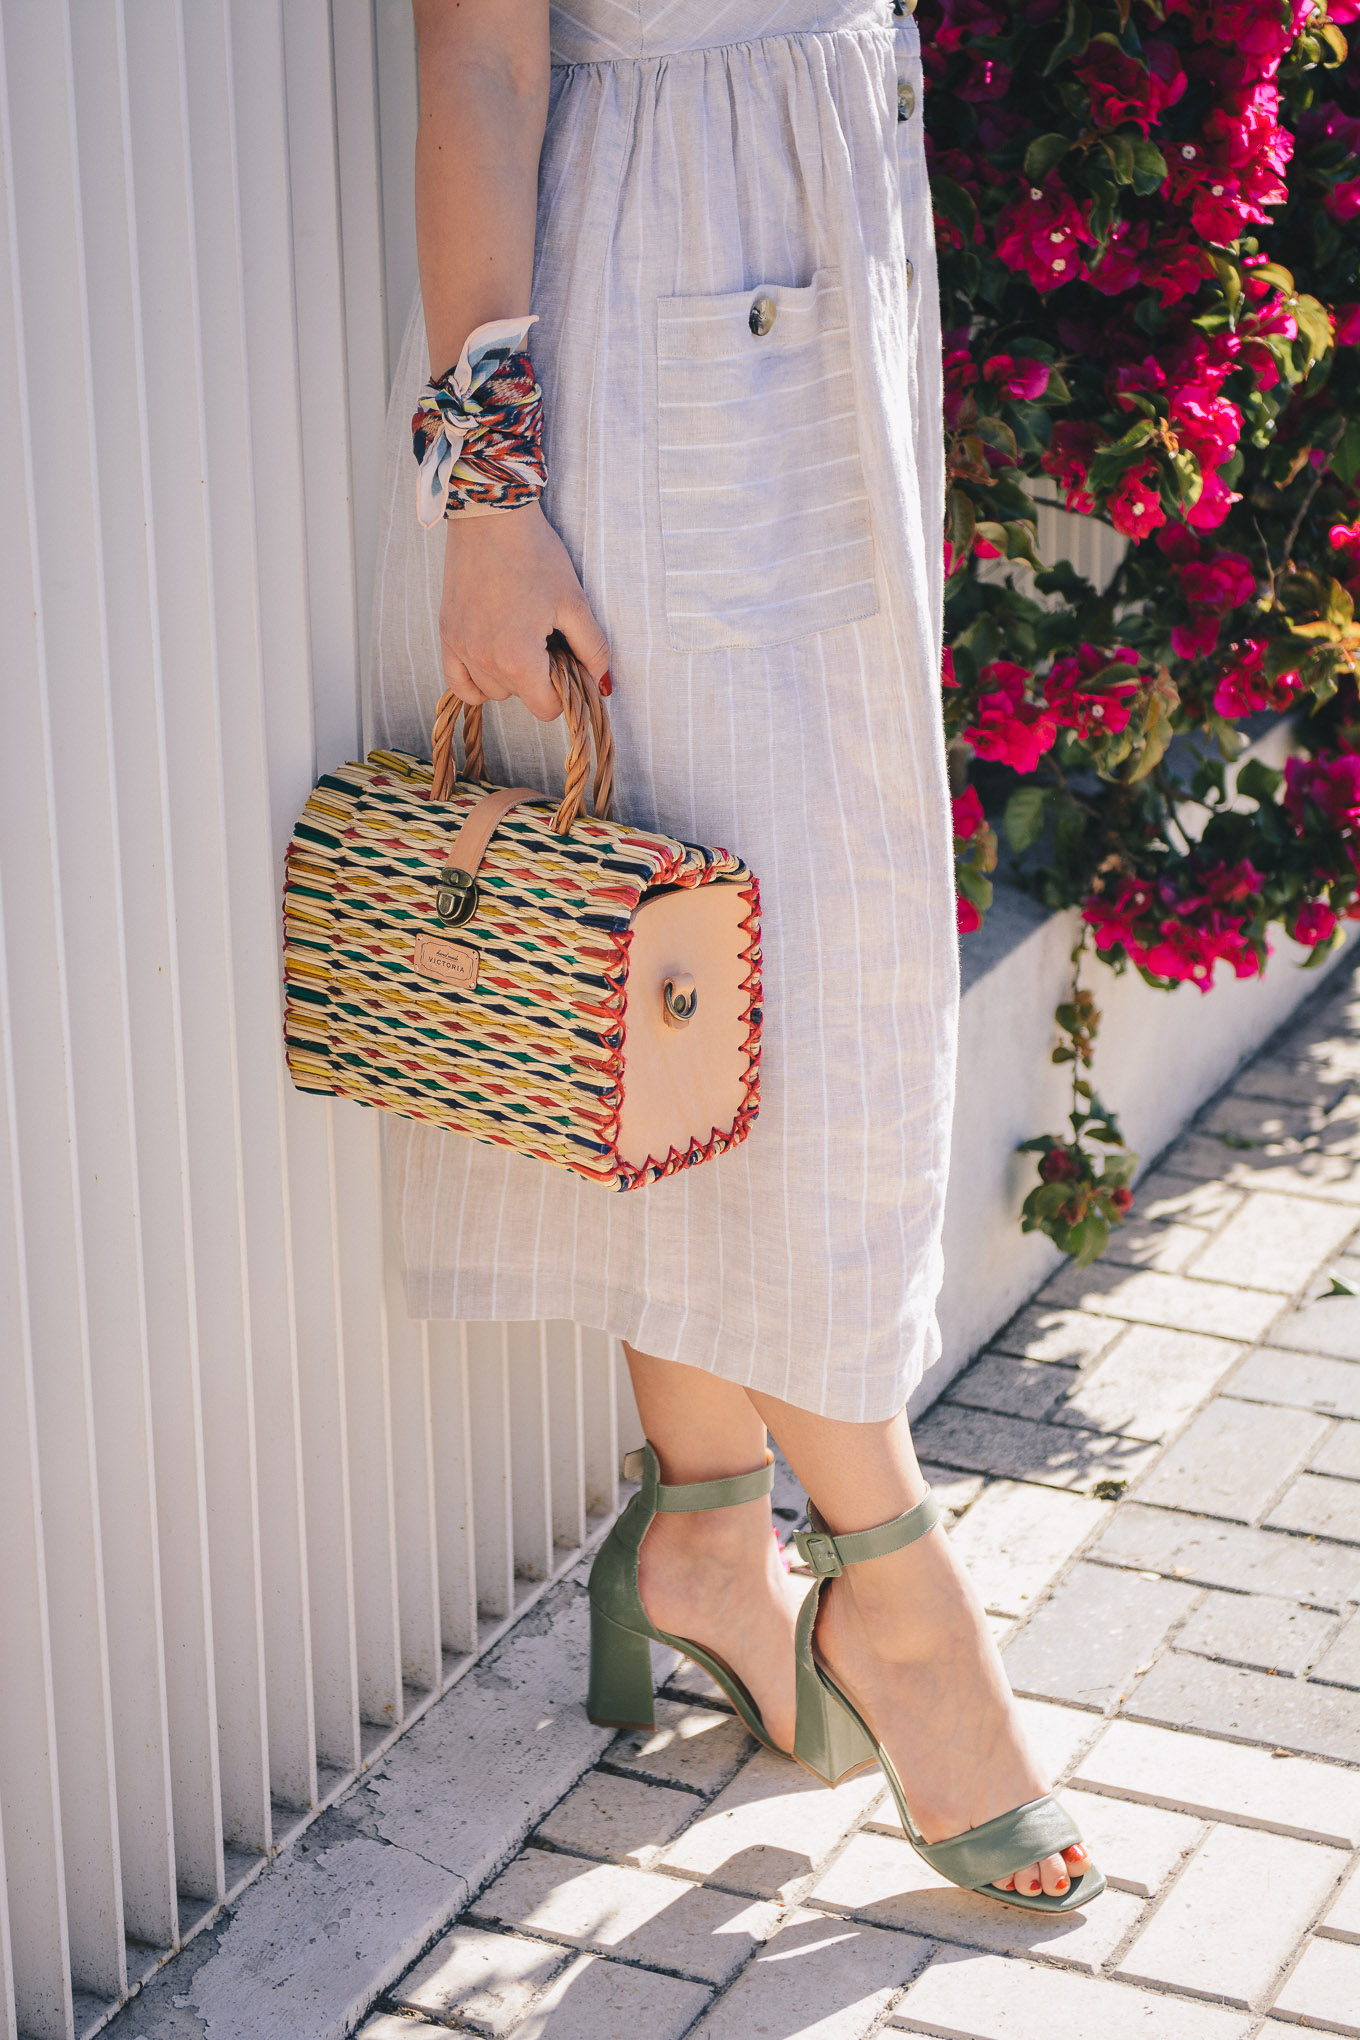 Victoria handmade basket ingiliz shoes